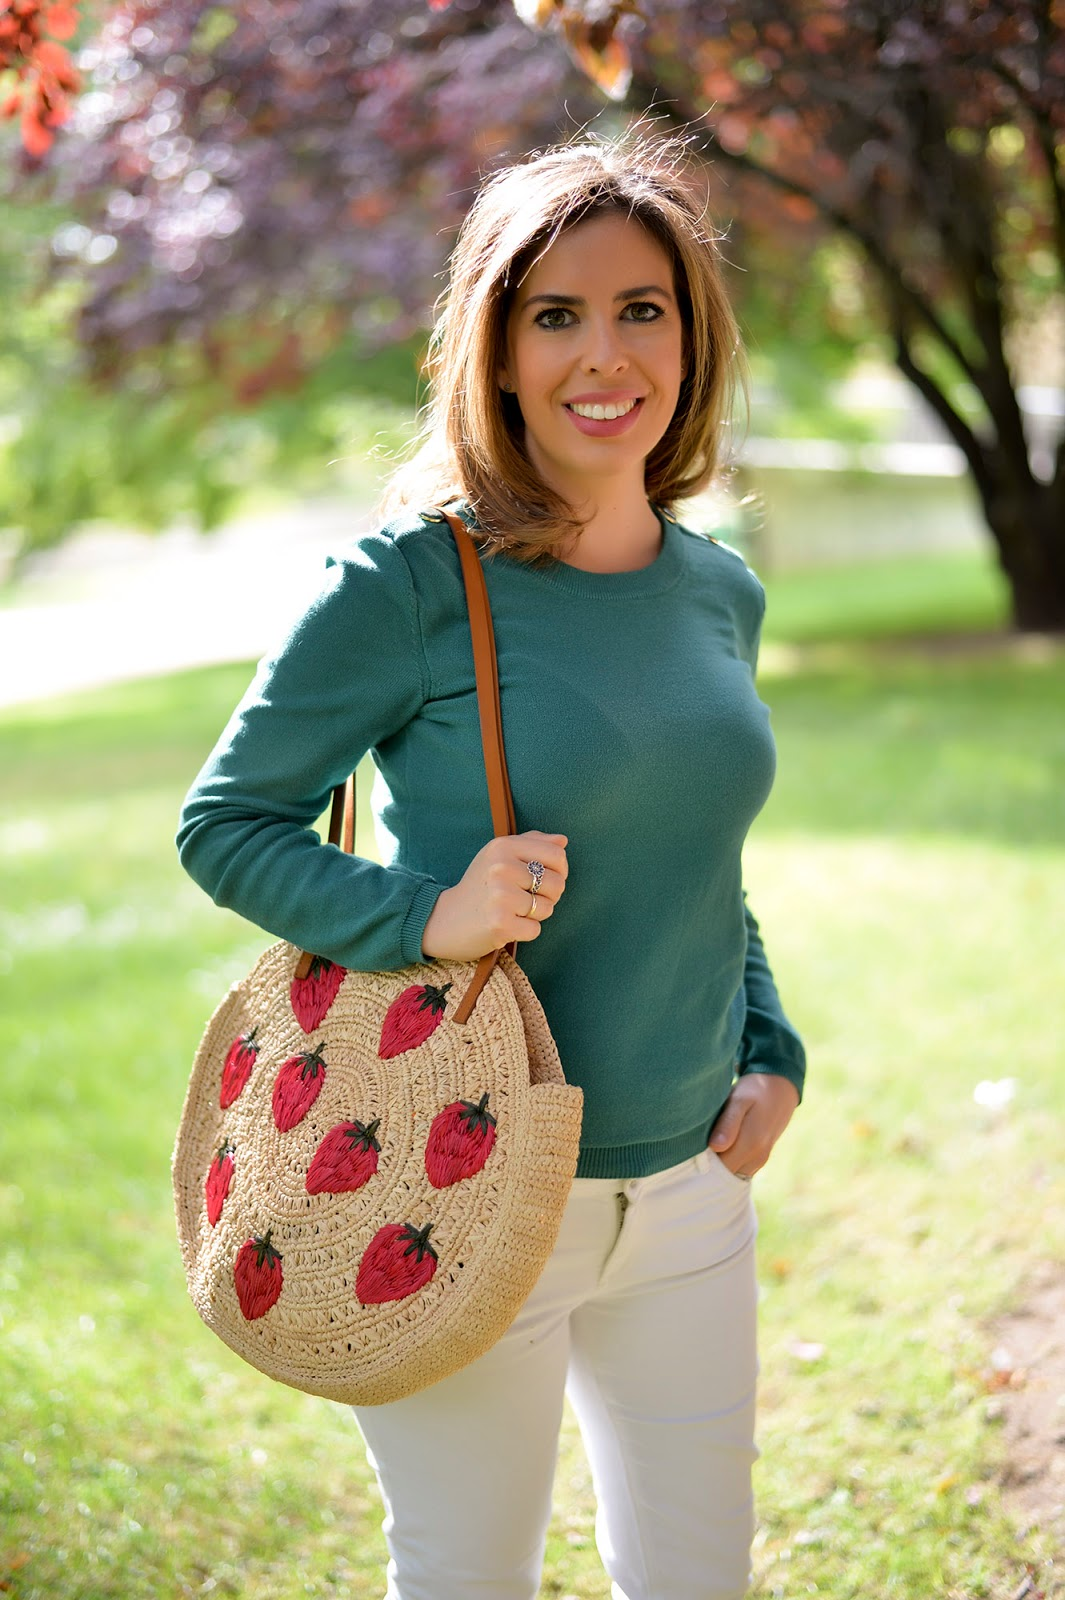 sezane basket straw raffia leather bag summer trend wicker purse tote strawberries